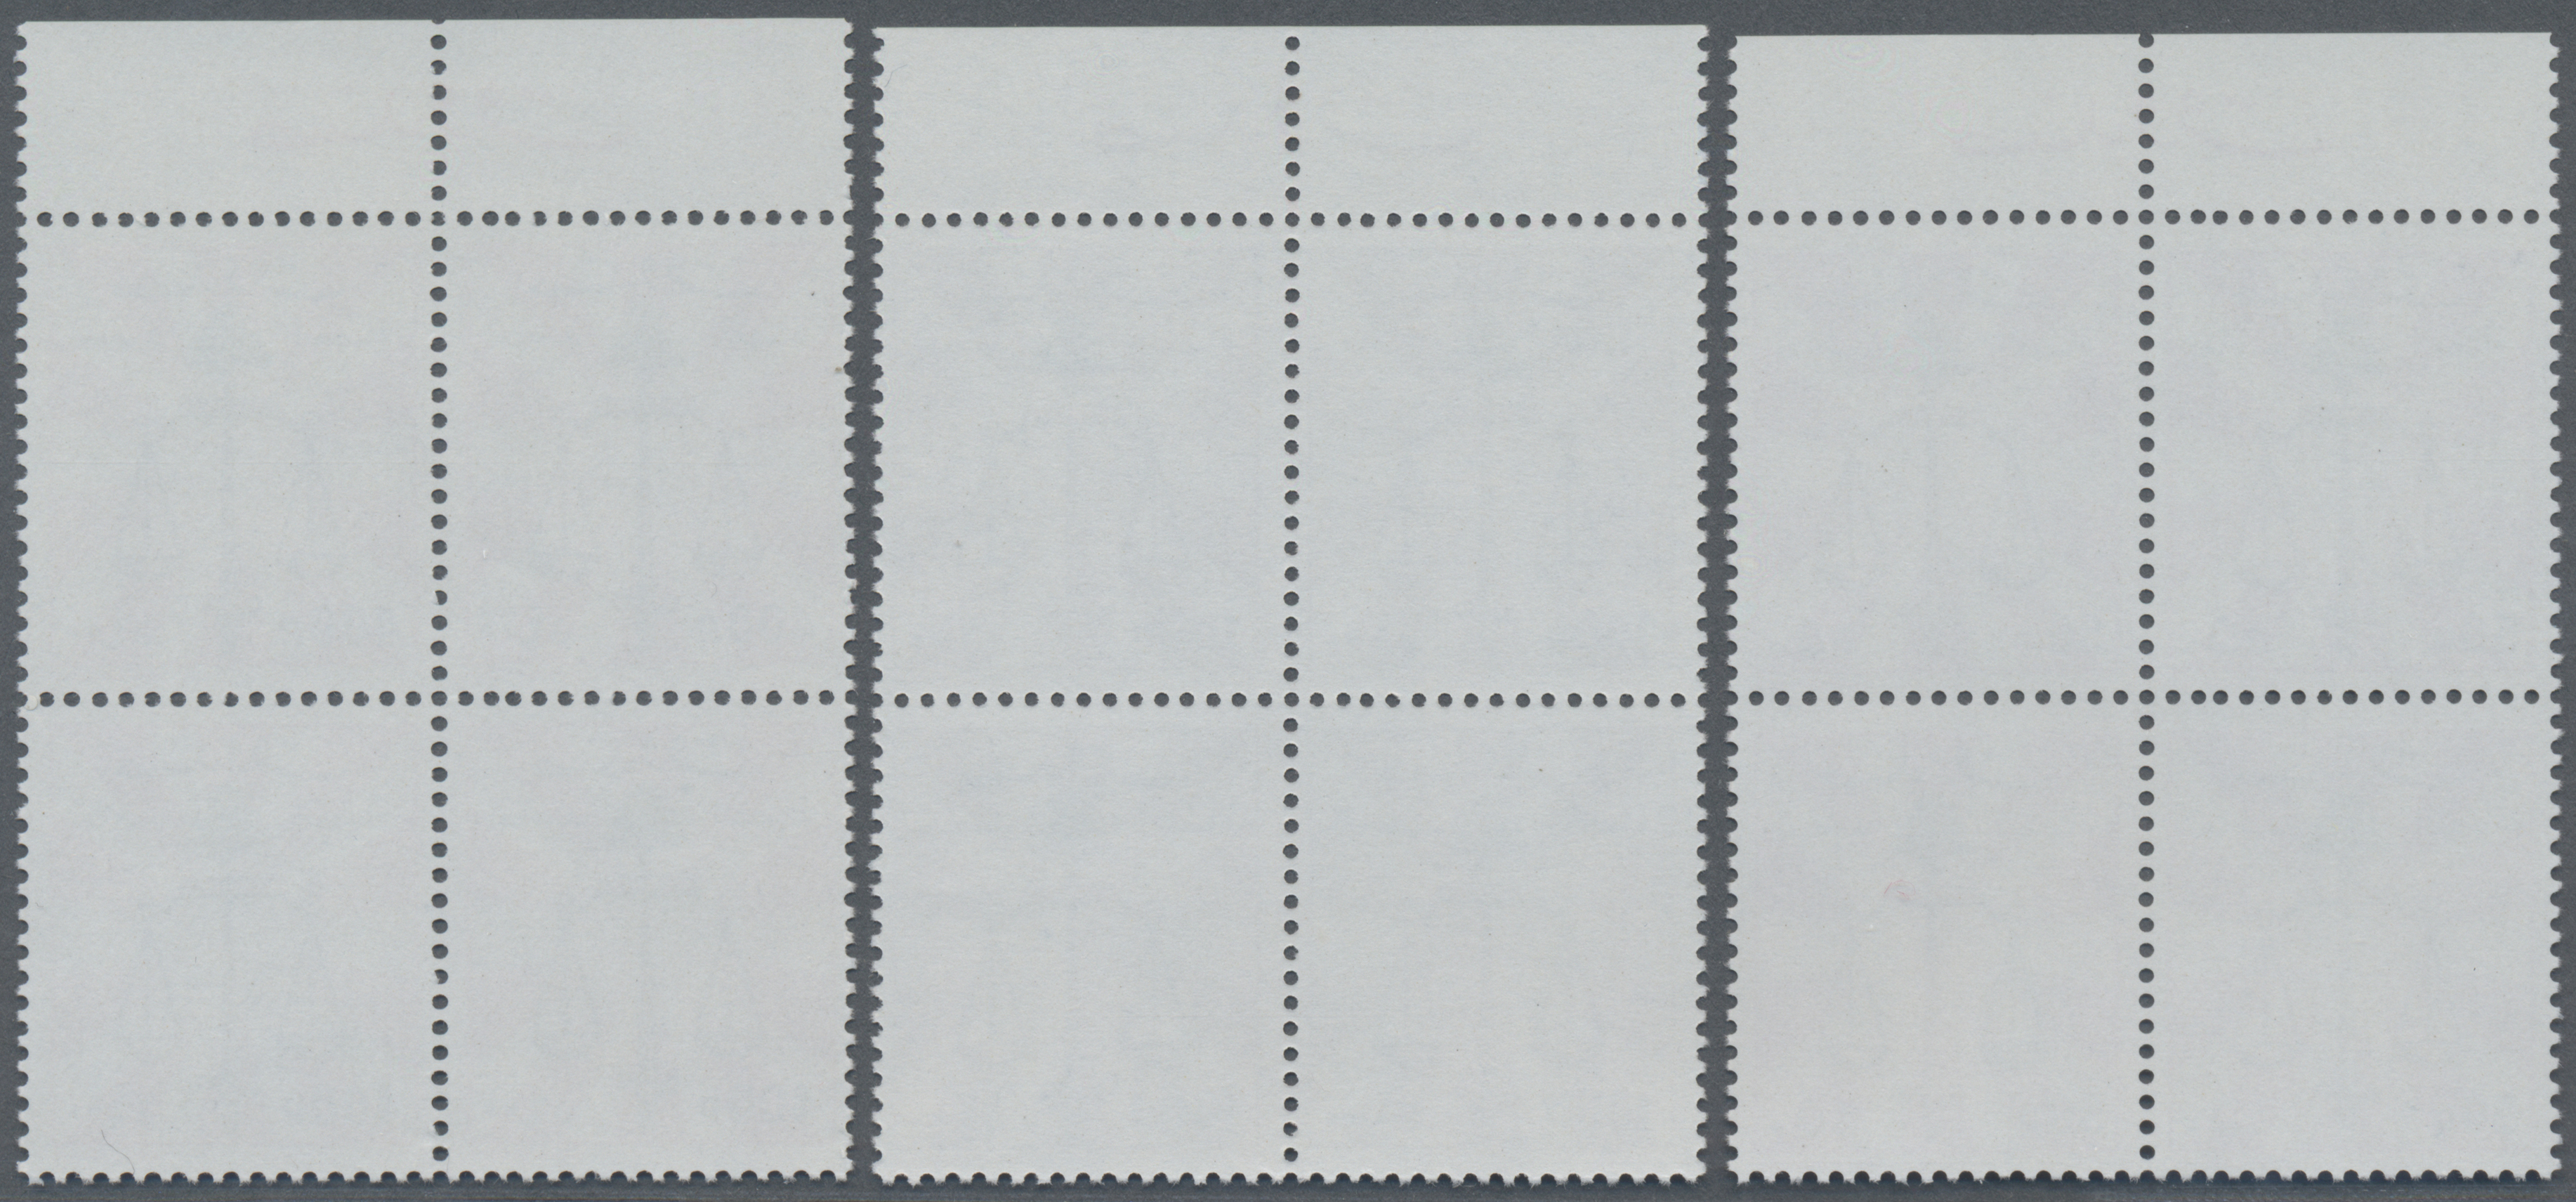 Lot 05671 - libanon  -  Auktionshaus Christoph Gärtner GmbH & Co. KG Sale #48 The Single Lots Philatelie